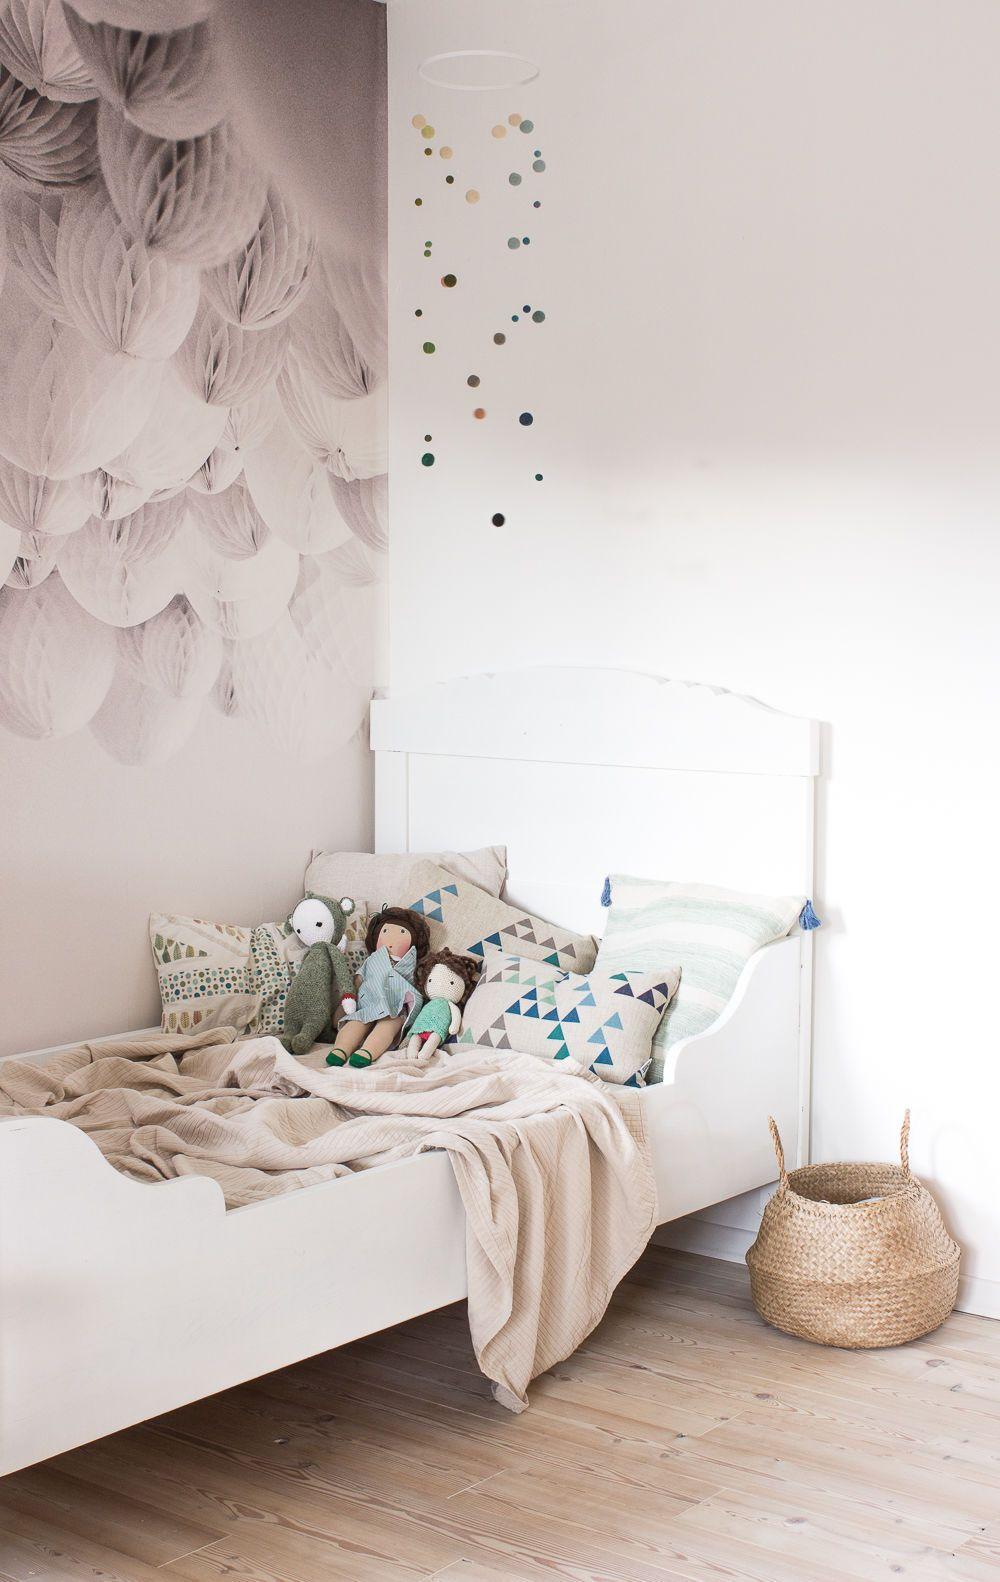 Full Size of Wandgestaltung Kinderzimmer Jungen Besten Ideen Fr Im Regal Weiß Sofa Regale Wohnzimmer Wandgestaltung Kinderzimmer Jungen